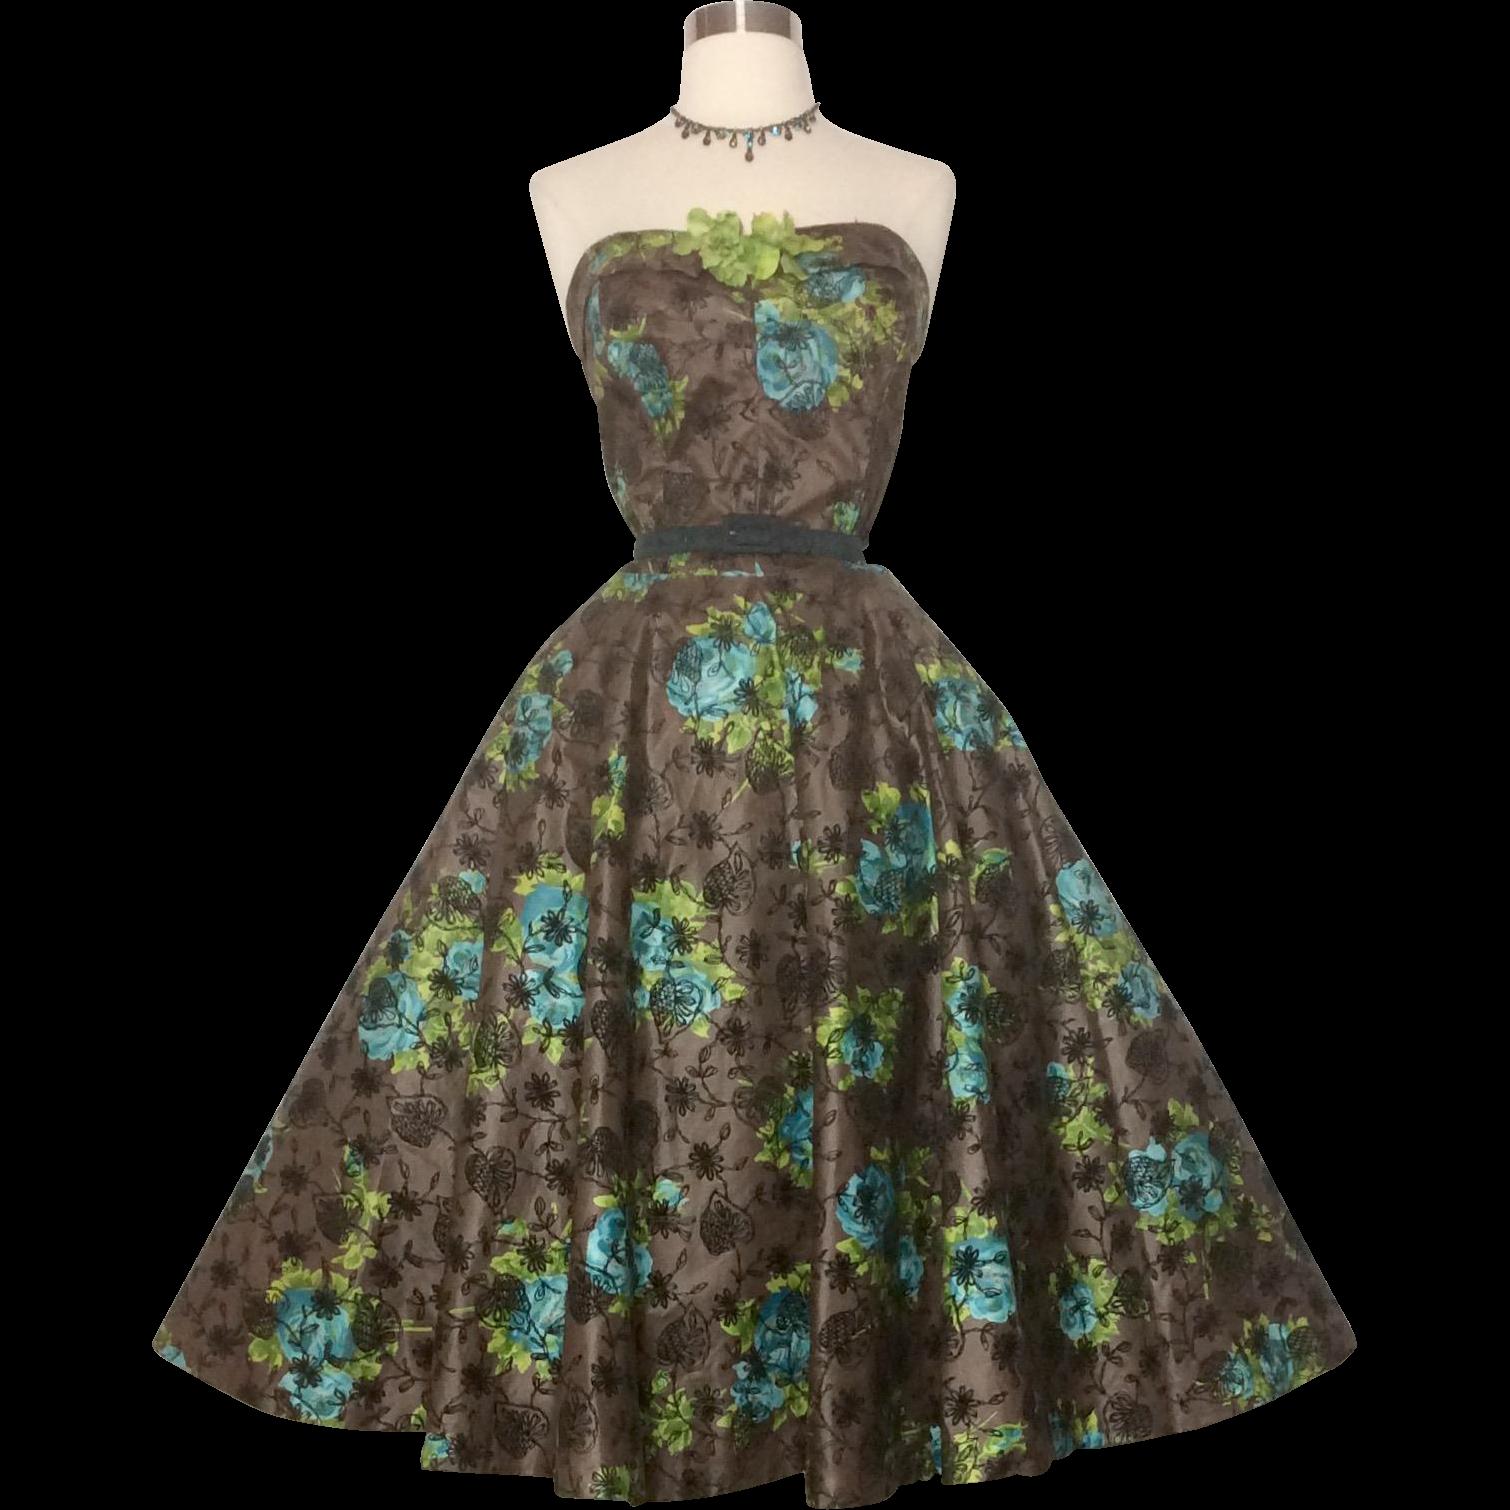 Vintage 1950s Dress//50s Strapless Dress//Floral//Rockabilly//Full ...